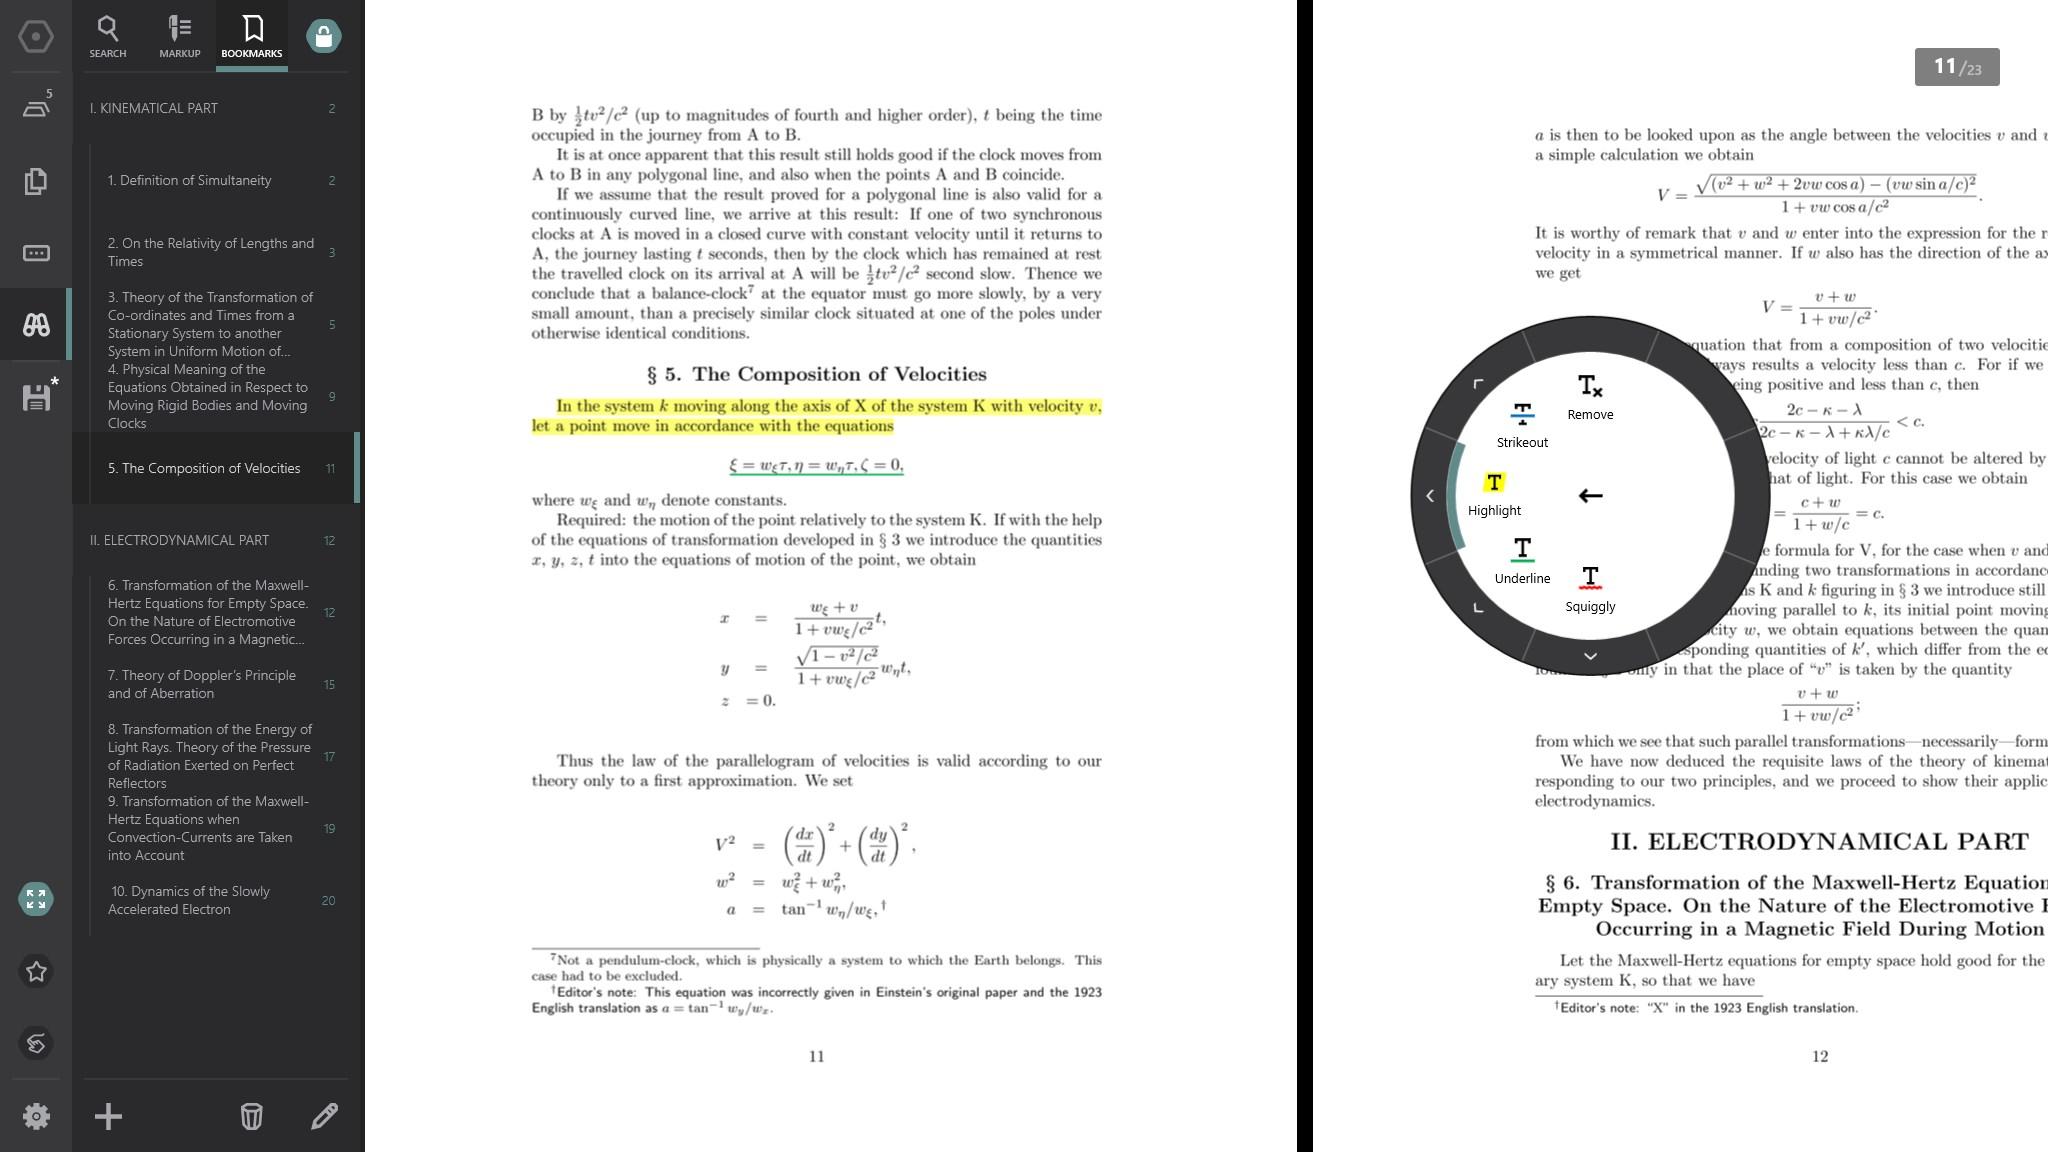 drawboard pdf windows 10 crack